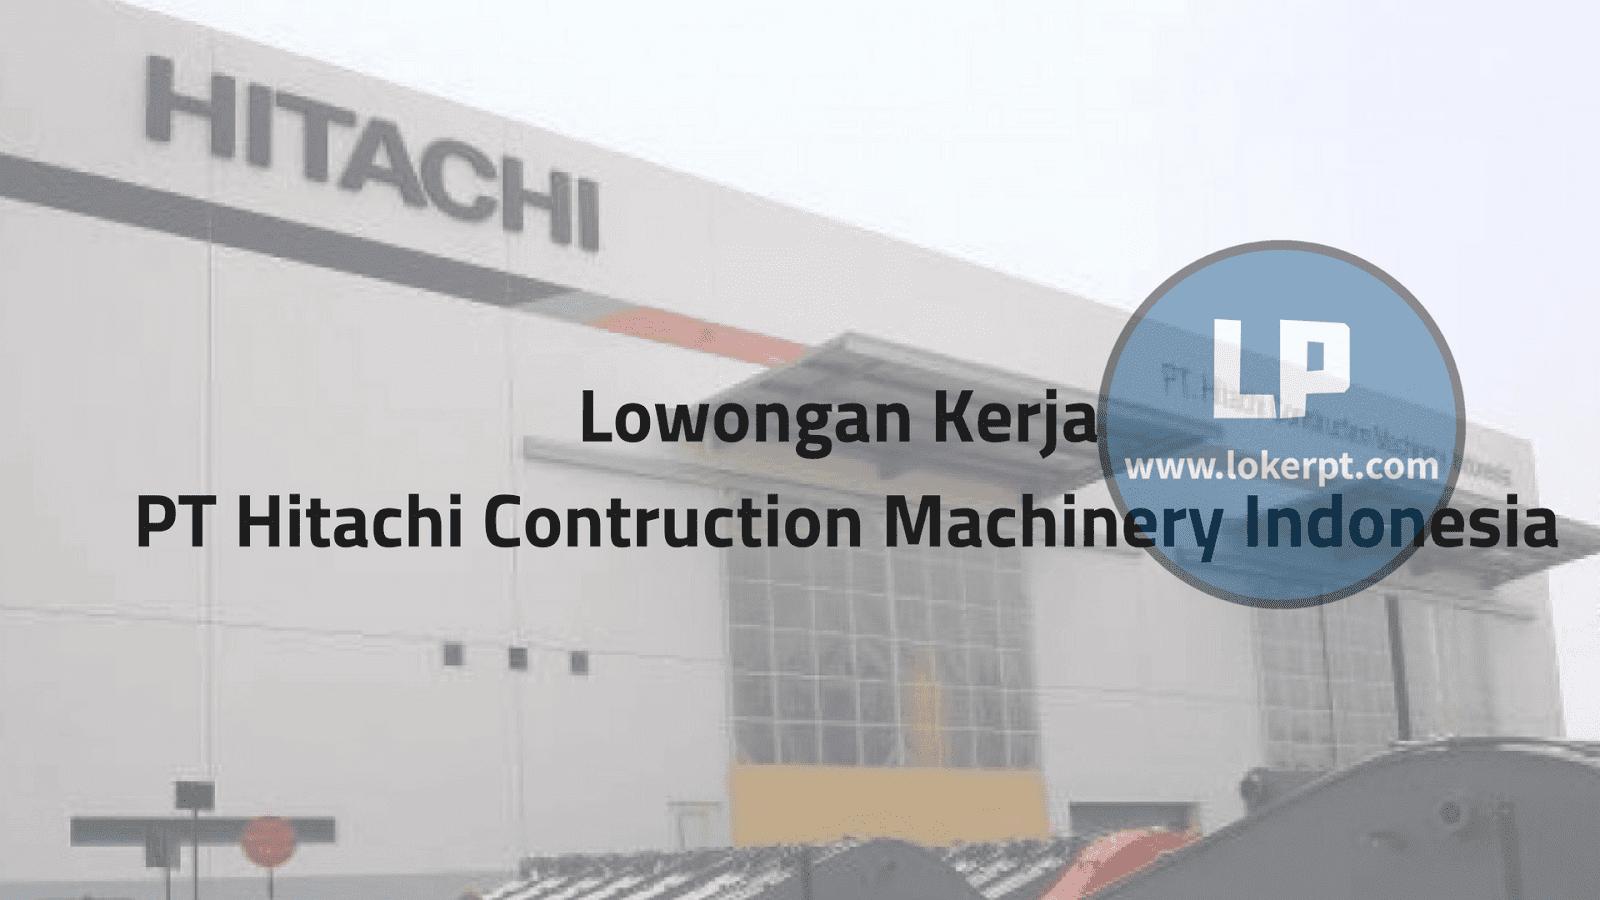 Lowongan Kerja PT Hitachi Contruction Machinery Indonesia